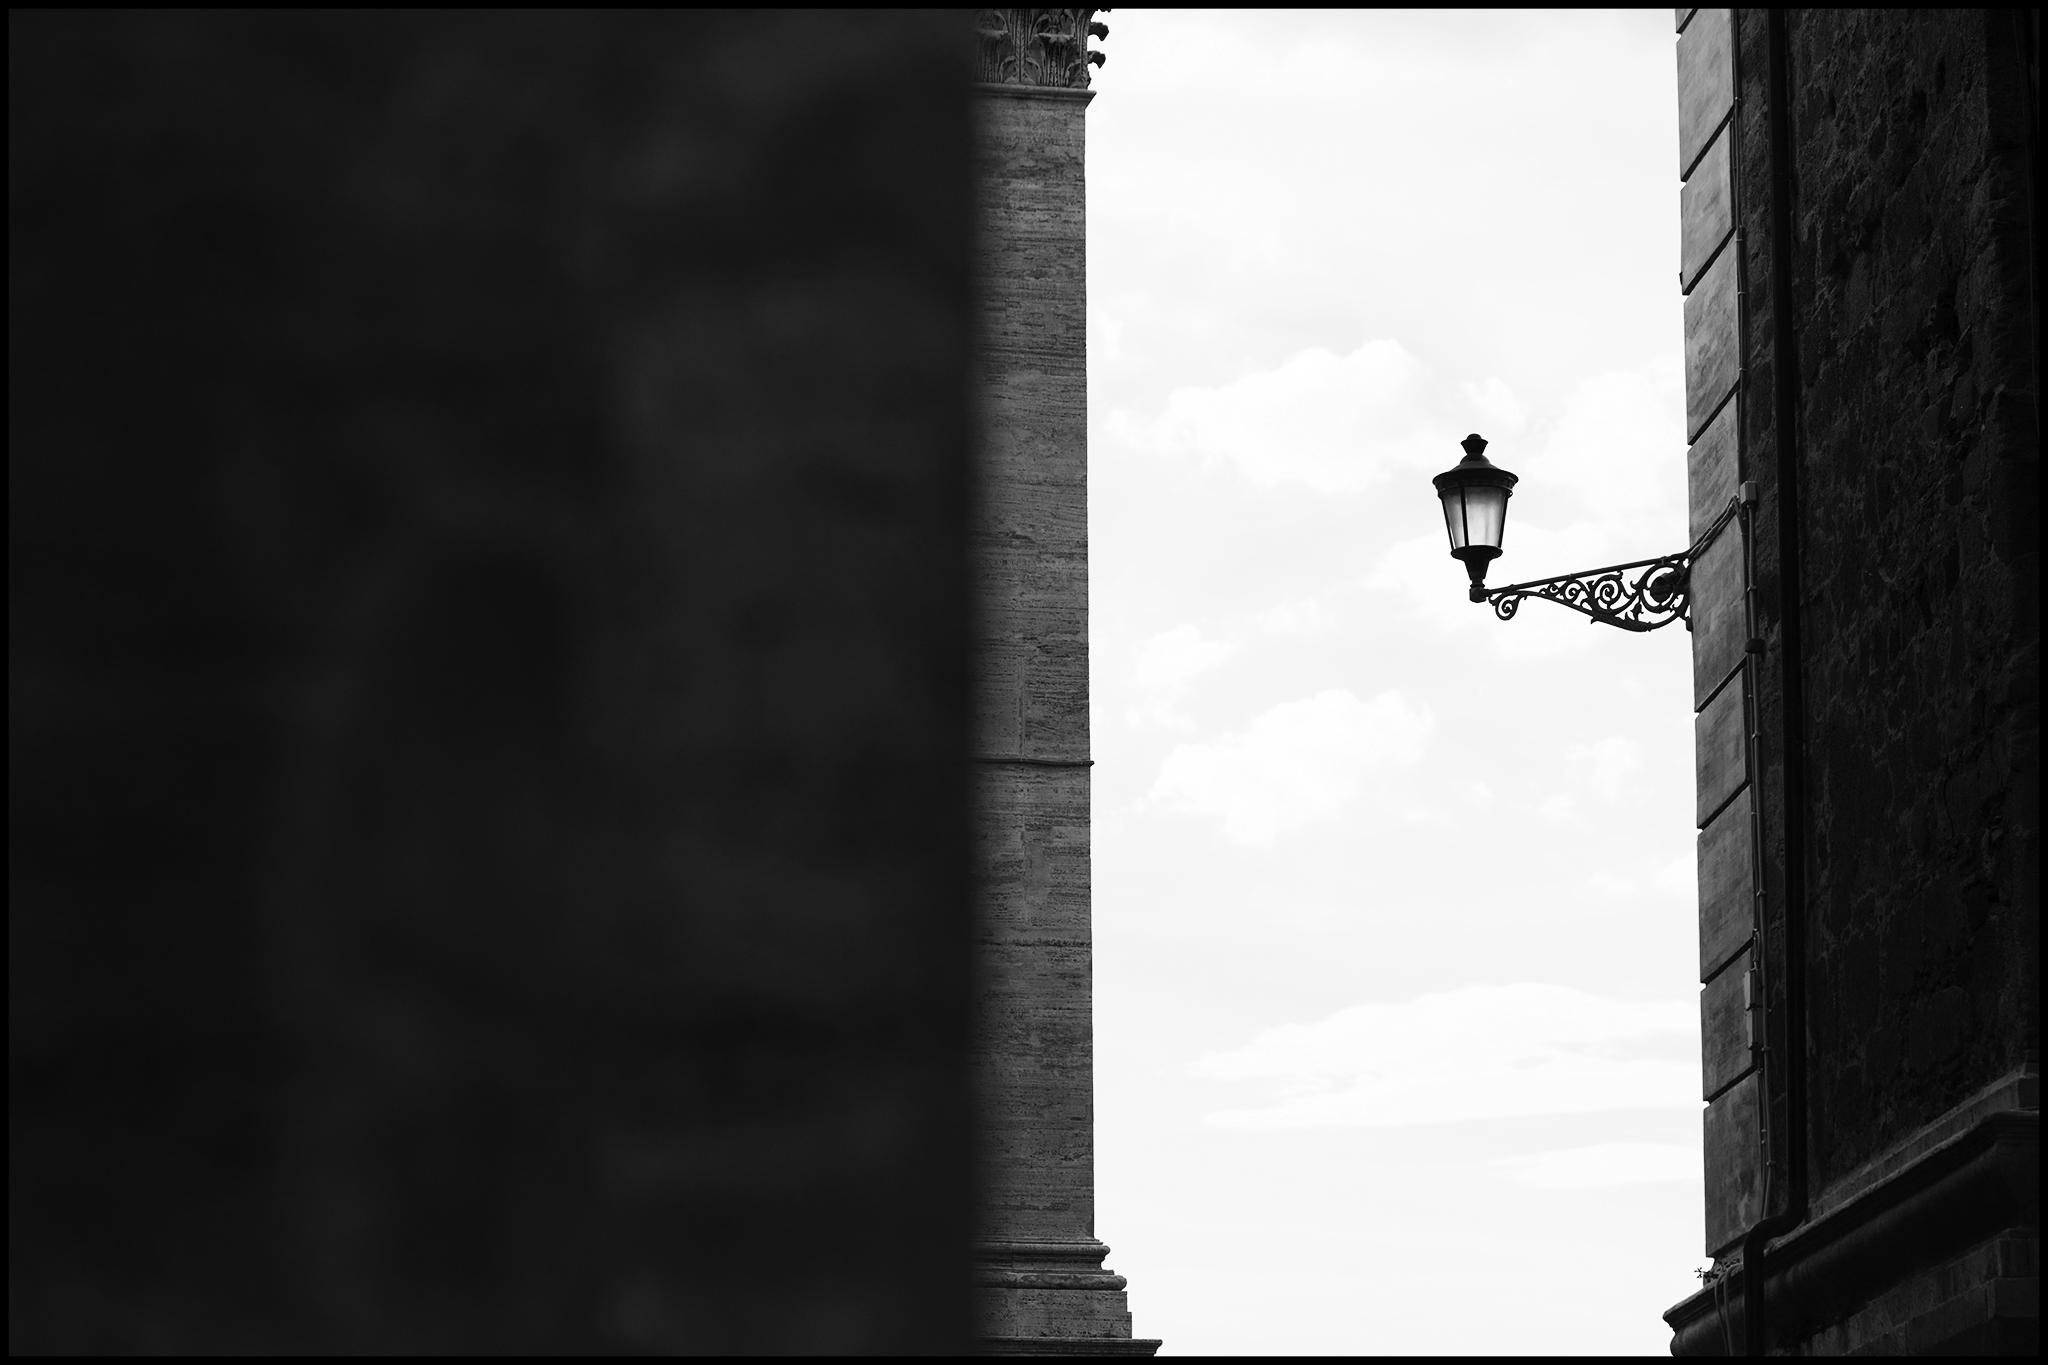 4 June 2019 - Street lamp, Rome IT